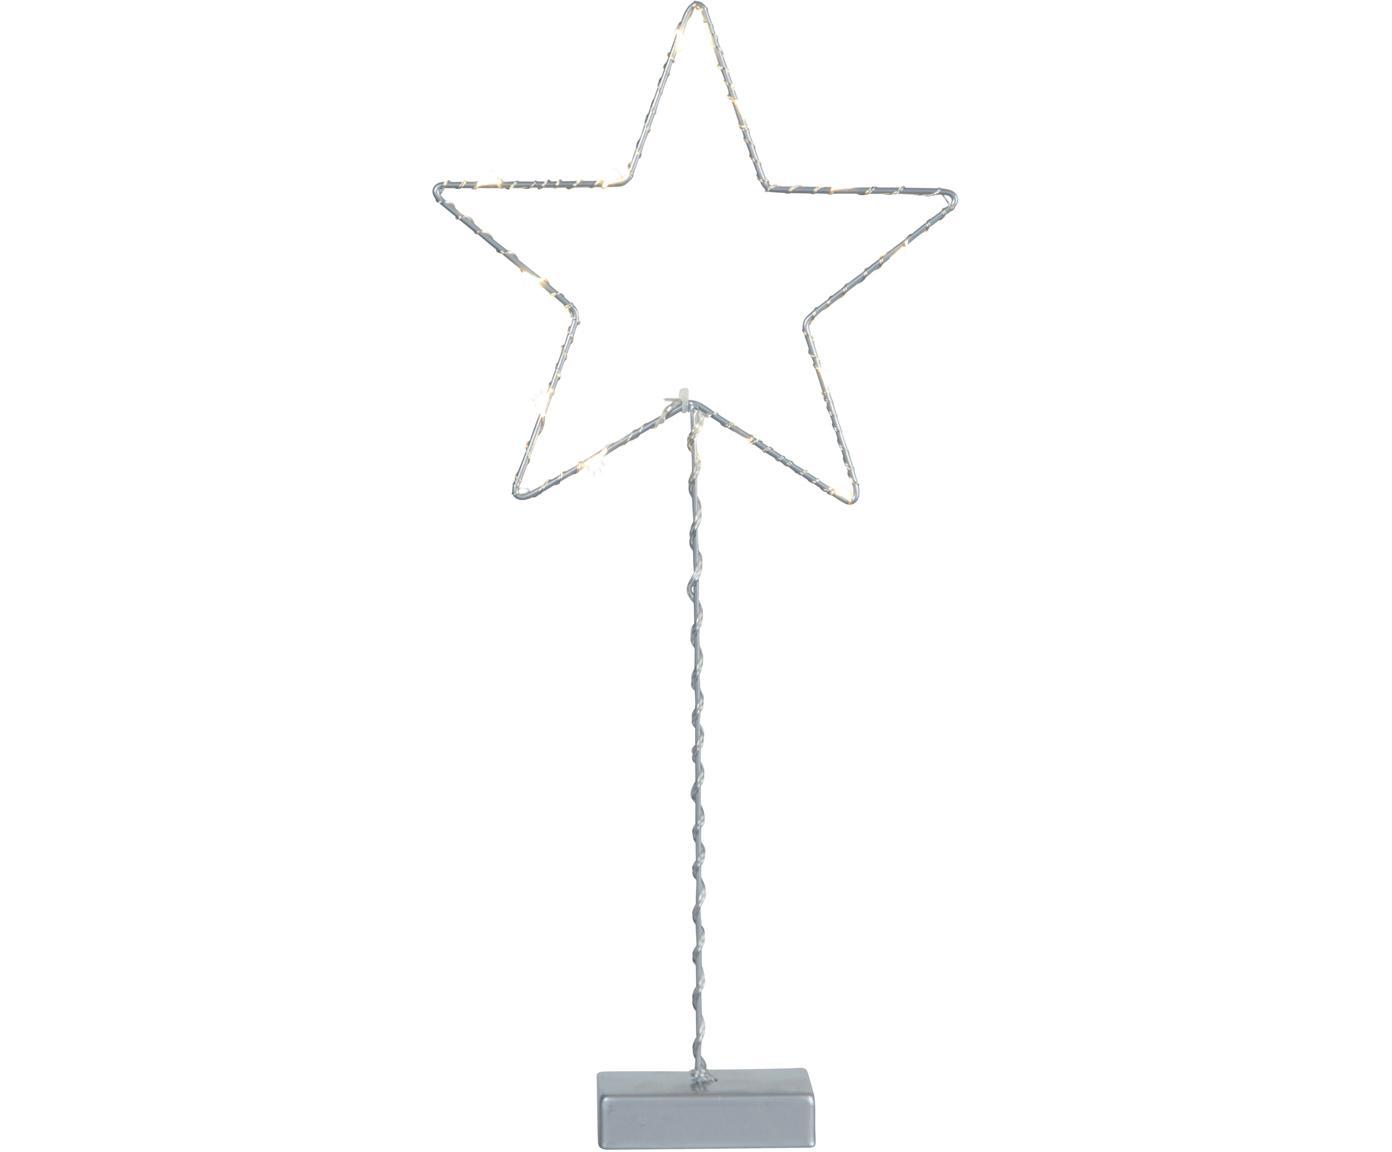 Objeto luminoso LED Star, funciona a pilas, Cable: plástico, Gris, An 19 x Al 43 cm